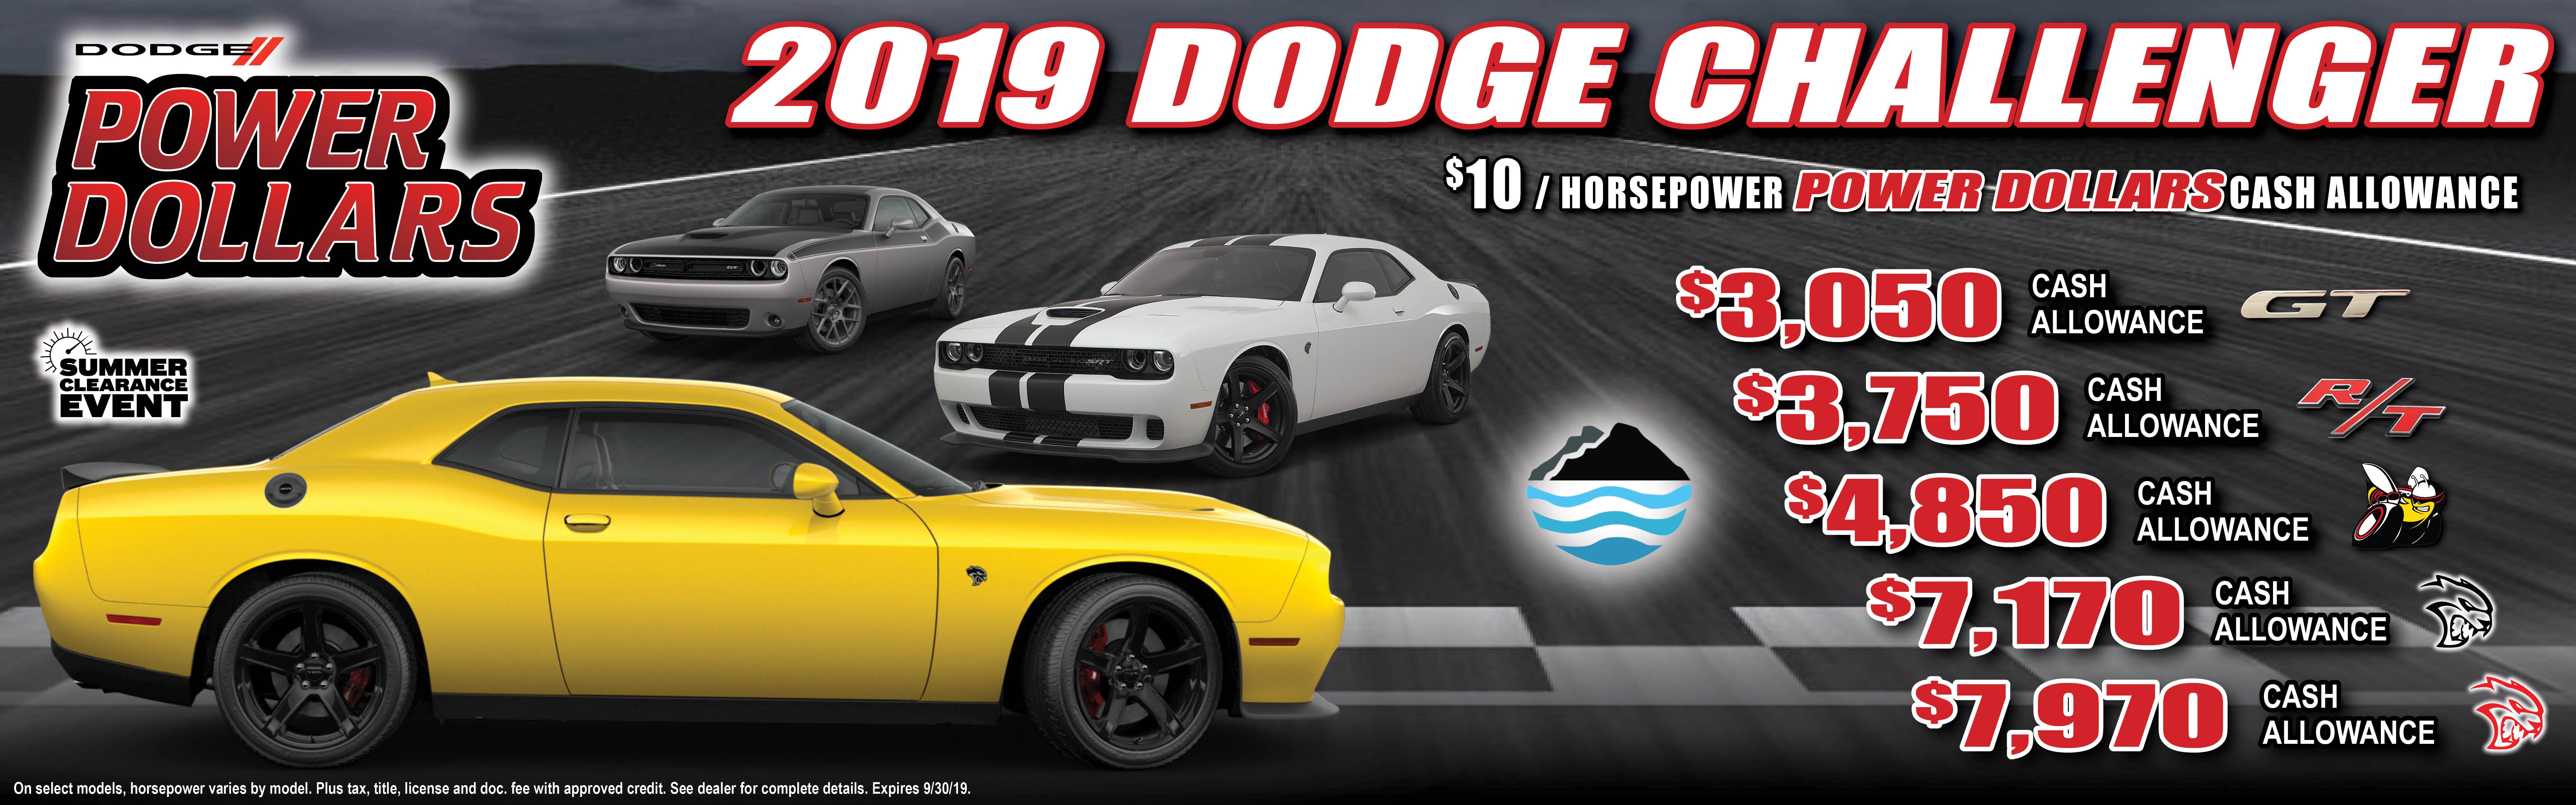 Power Dollars - 2019 Challenger